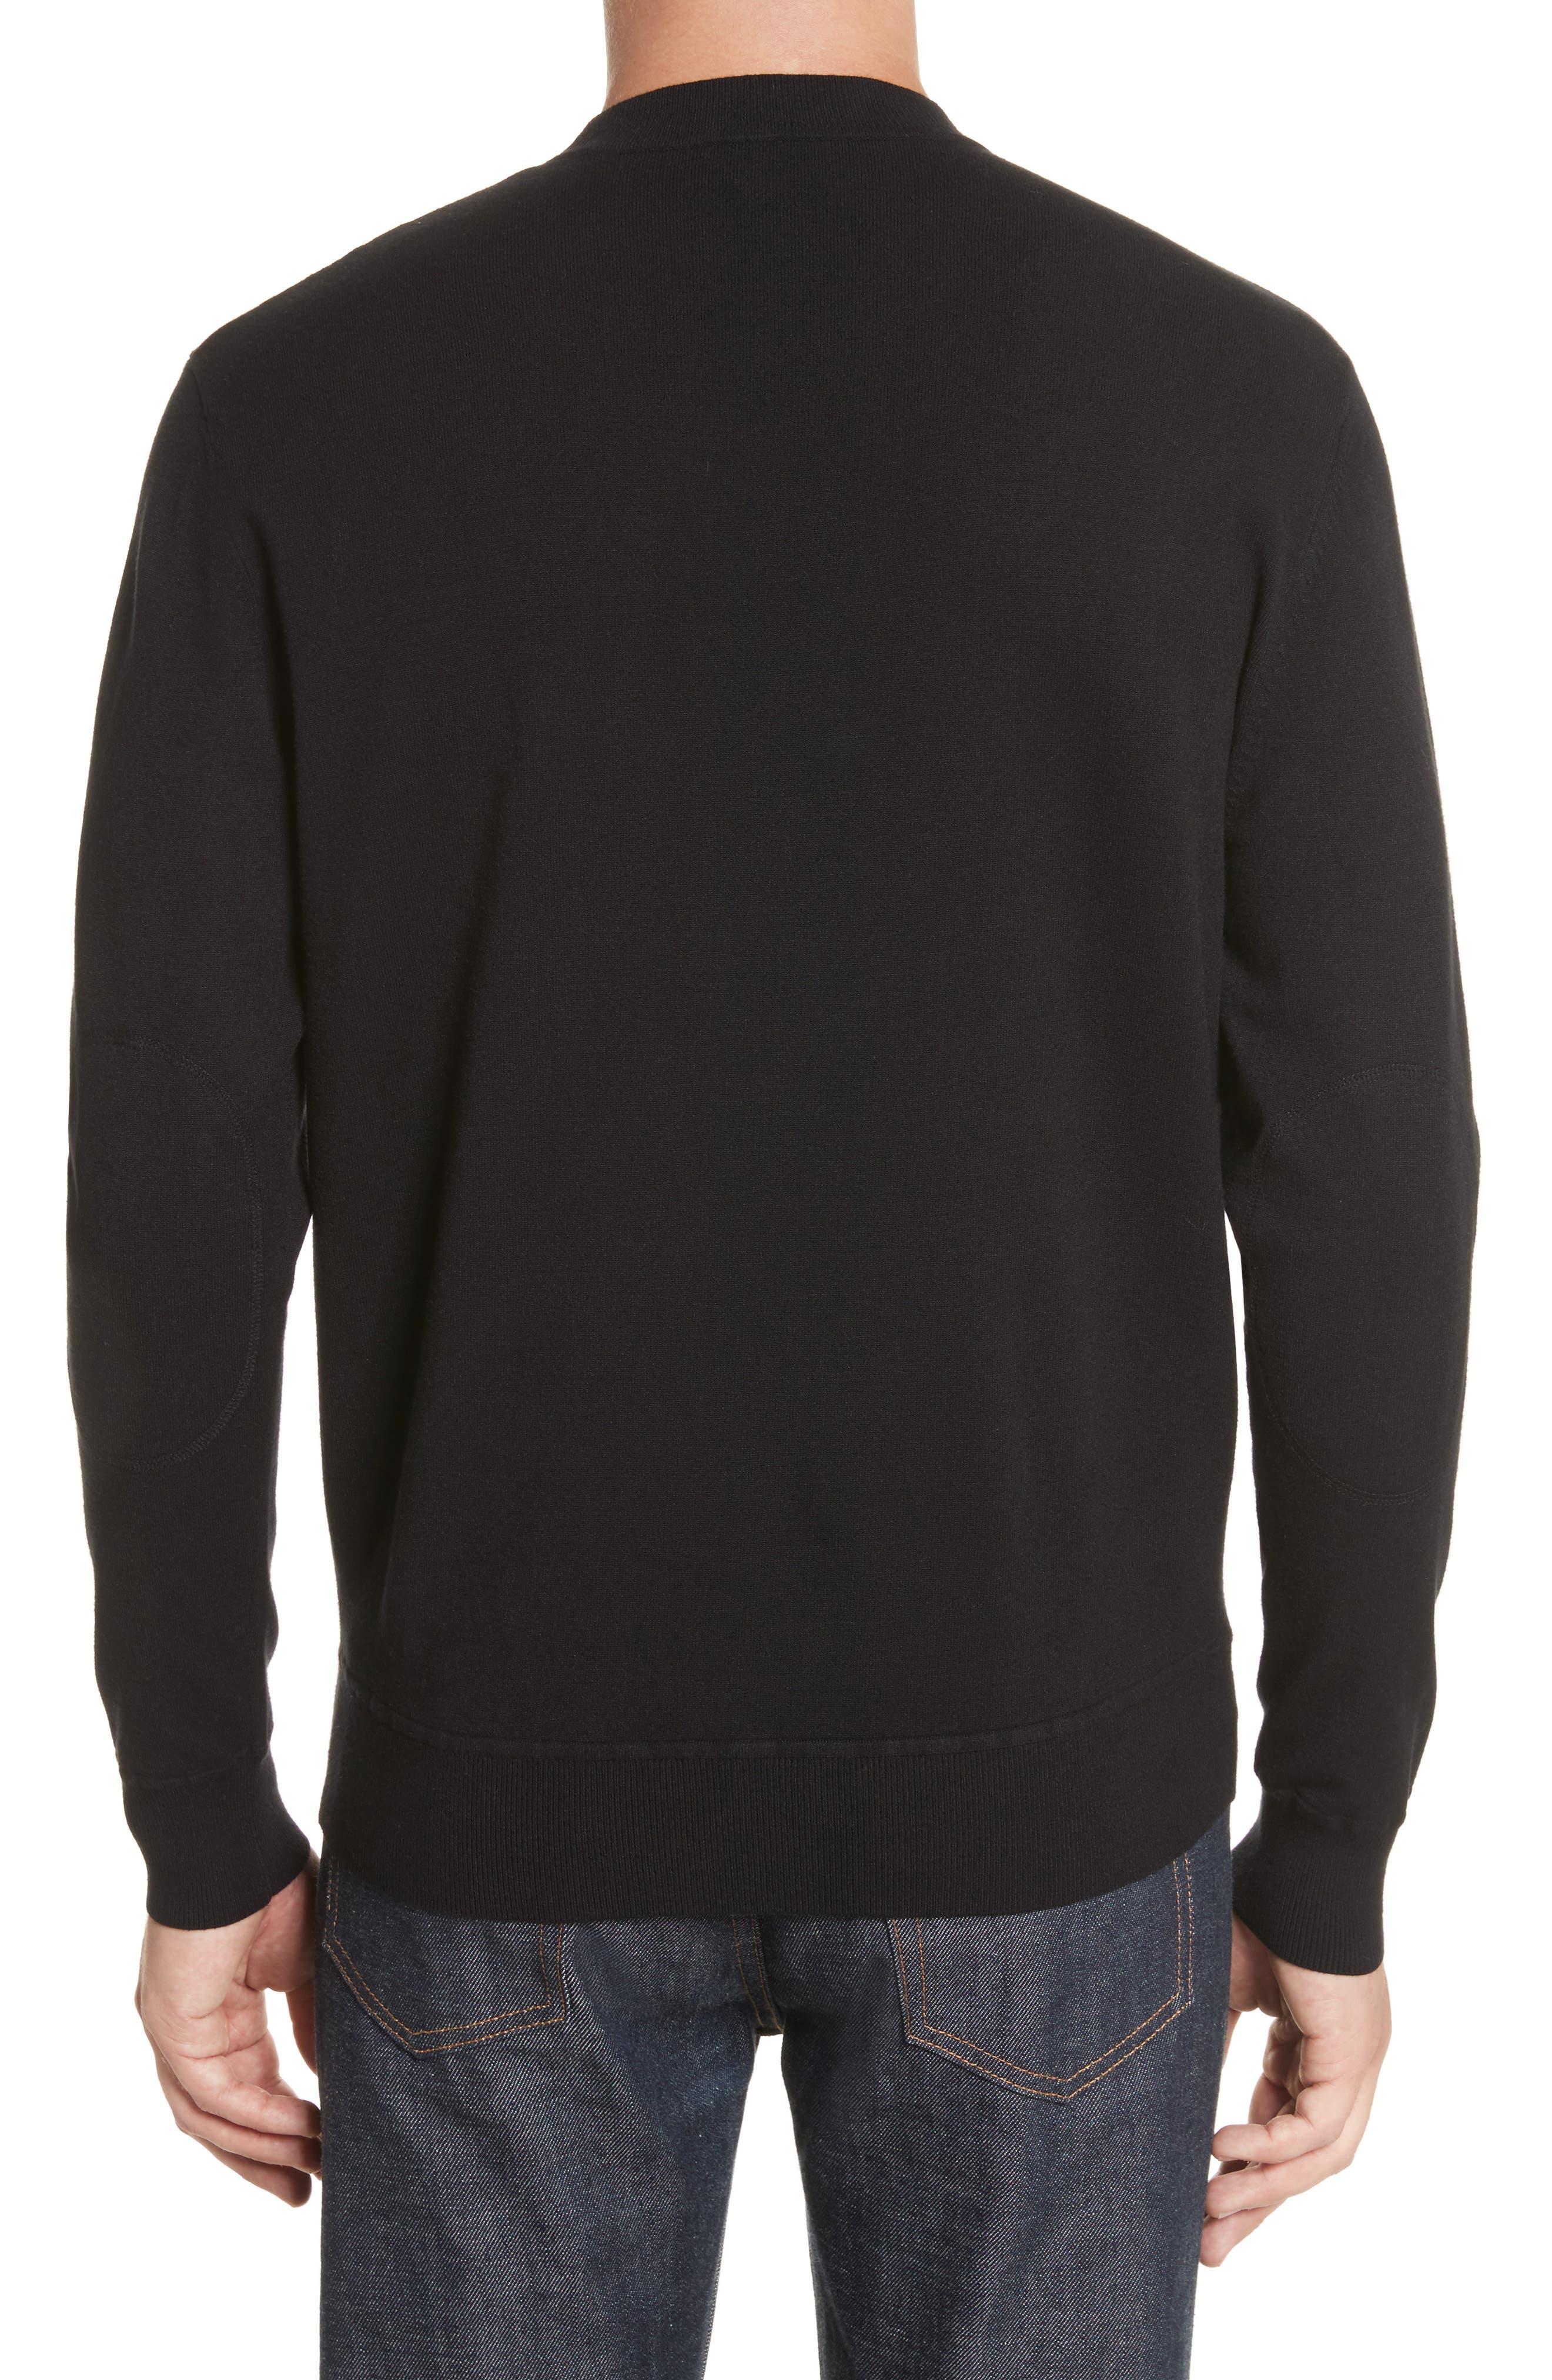 Ronnie Crewneck Sweatshirt,                             Alternate thumbnail 2, color,                             Black